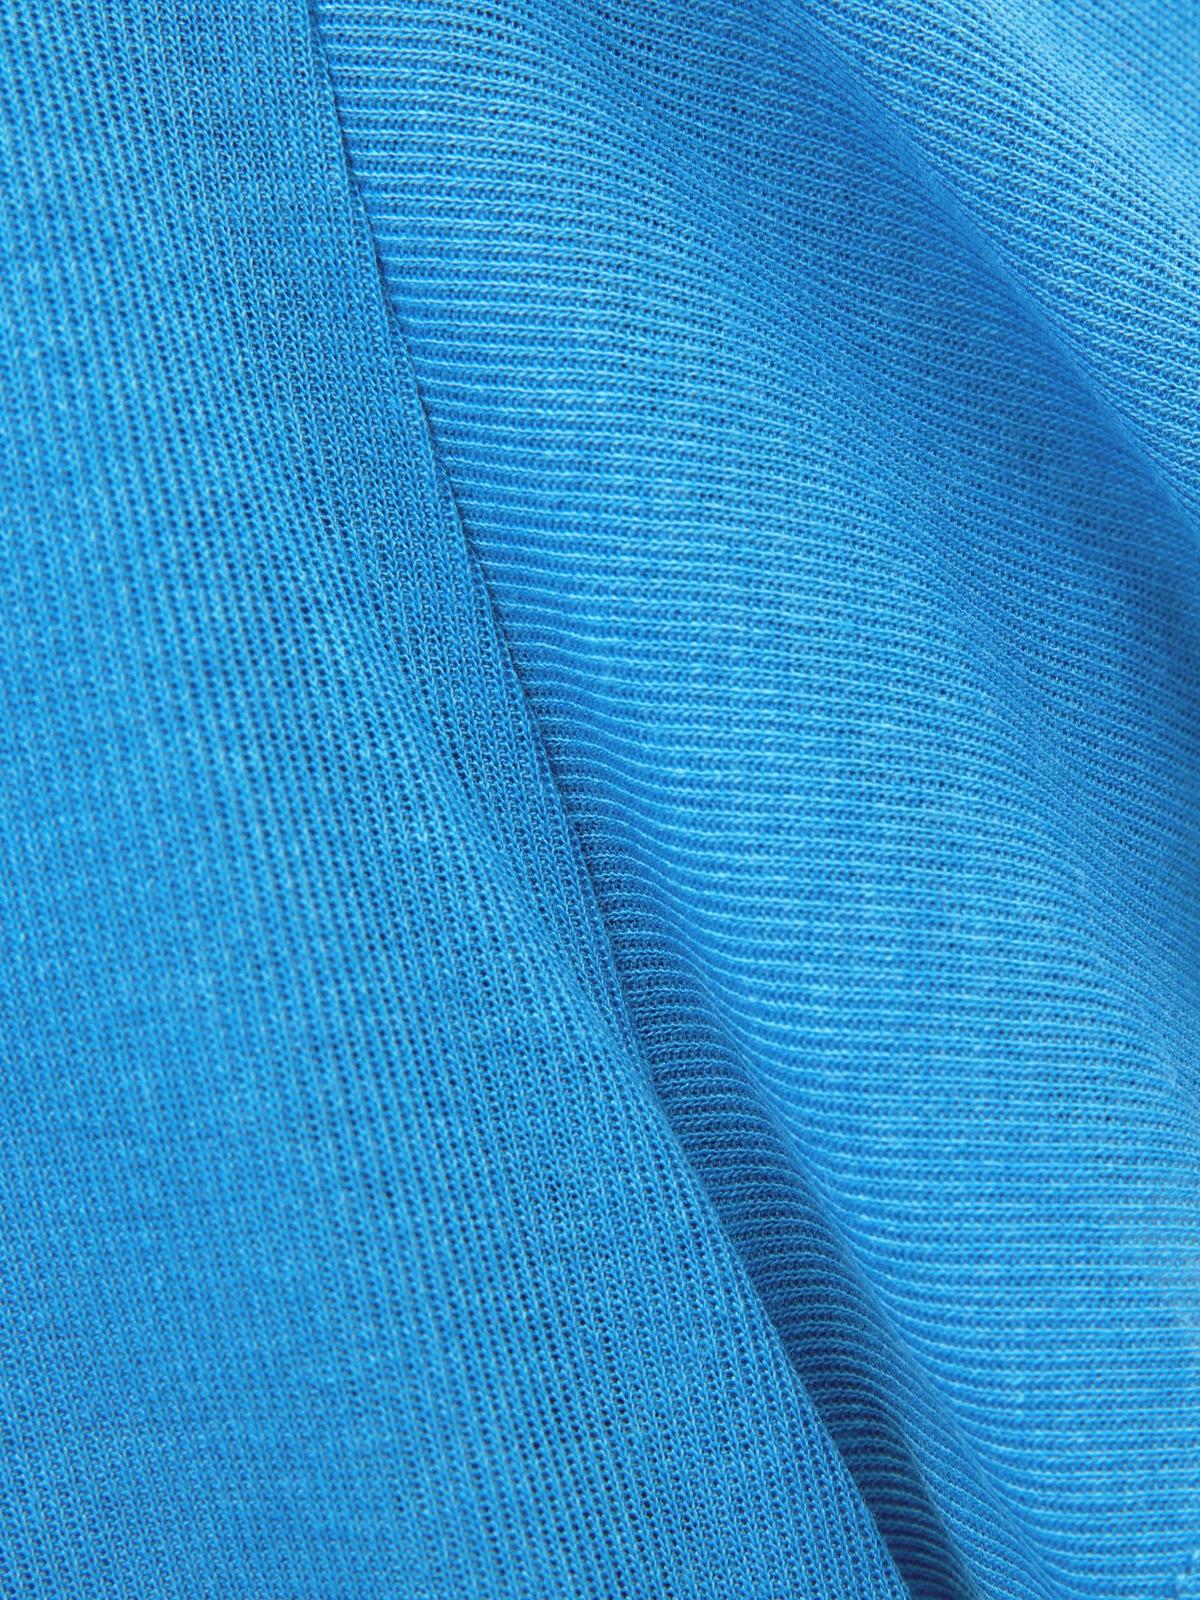 Butterfly Sleeve Top Blue